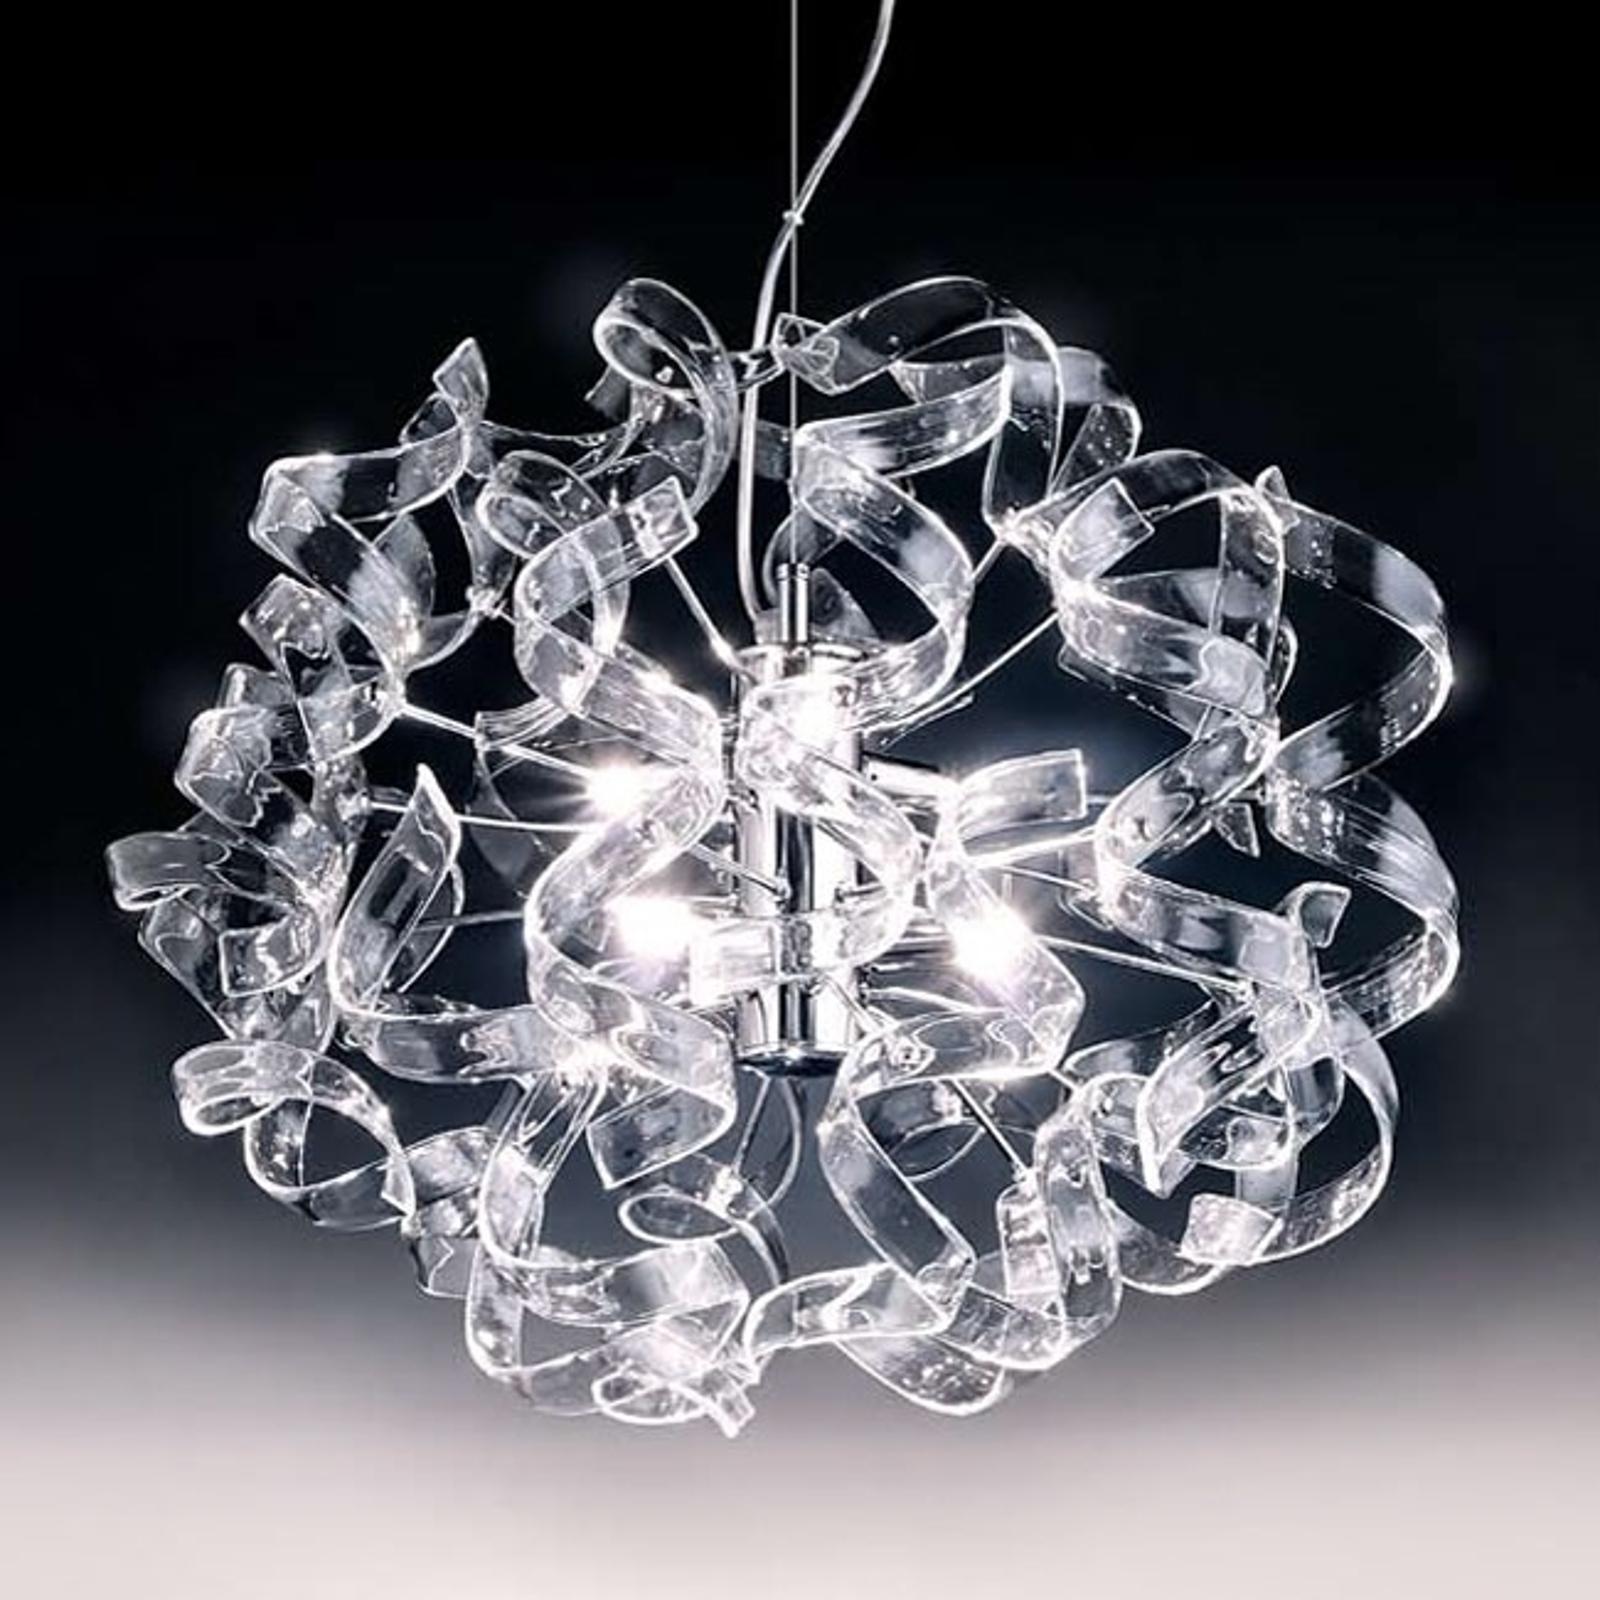 Lśniąca lampa wisząca Crystal, owal